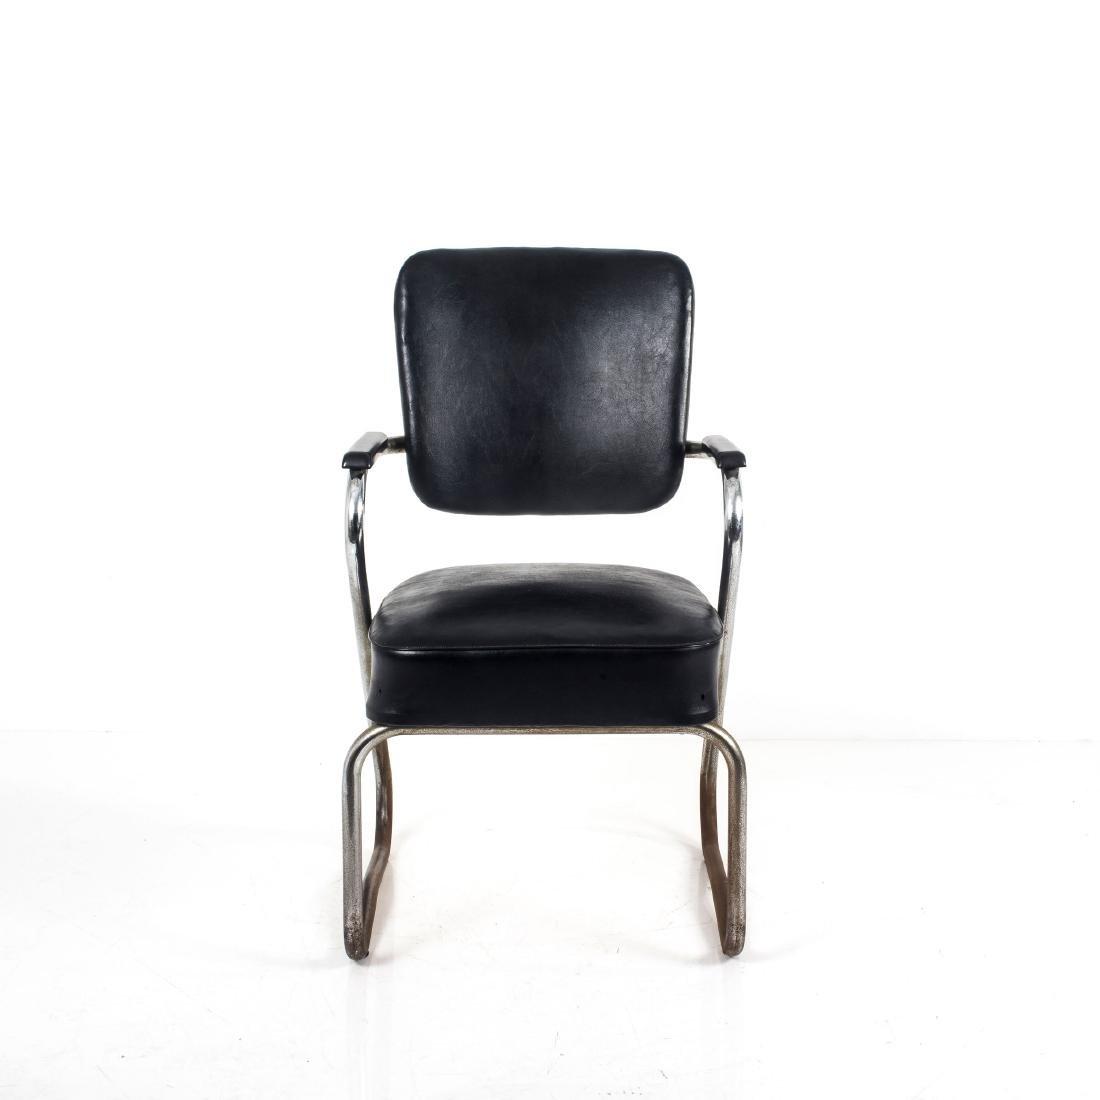 Tubular steel chair, c. 1935 - 8